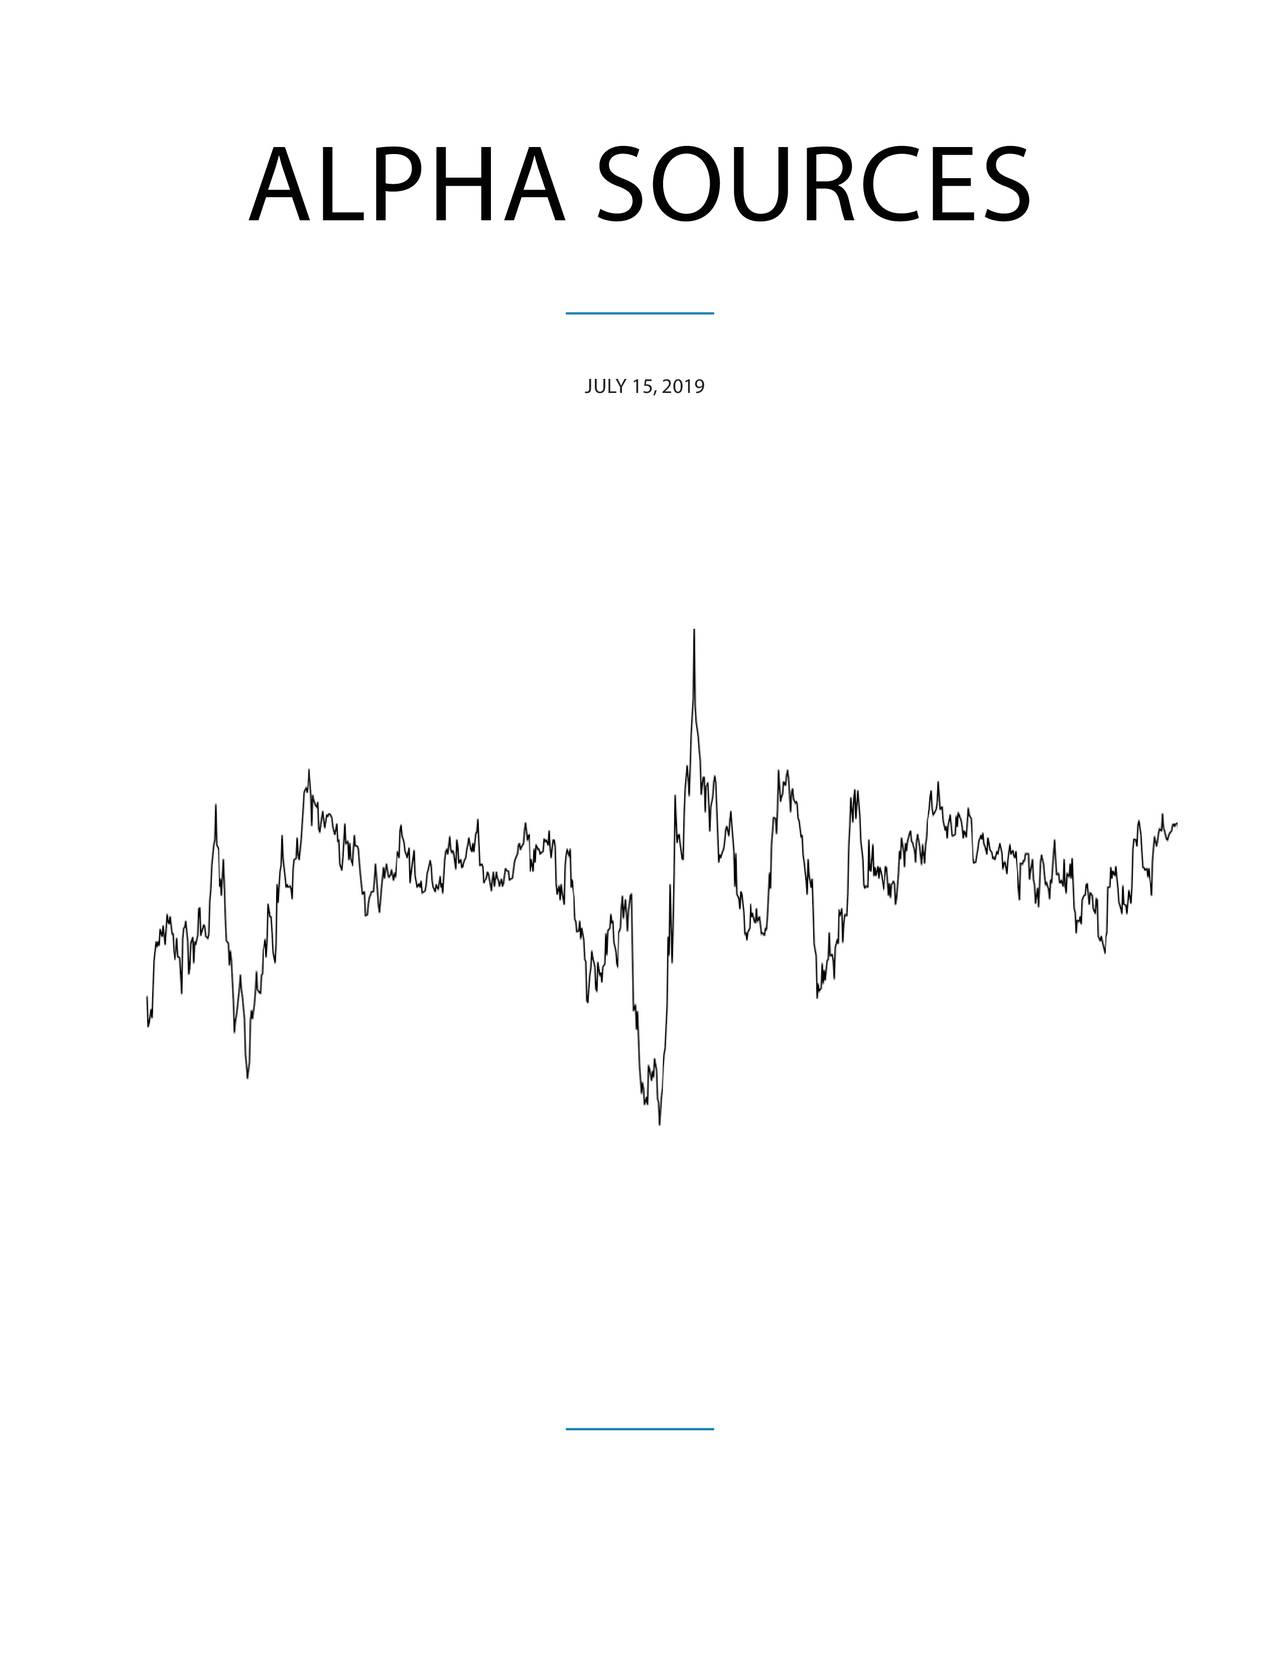 (FX) Volatility To Make A Comeback?